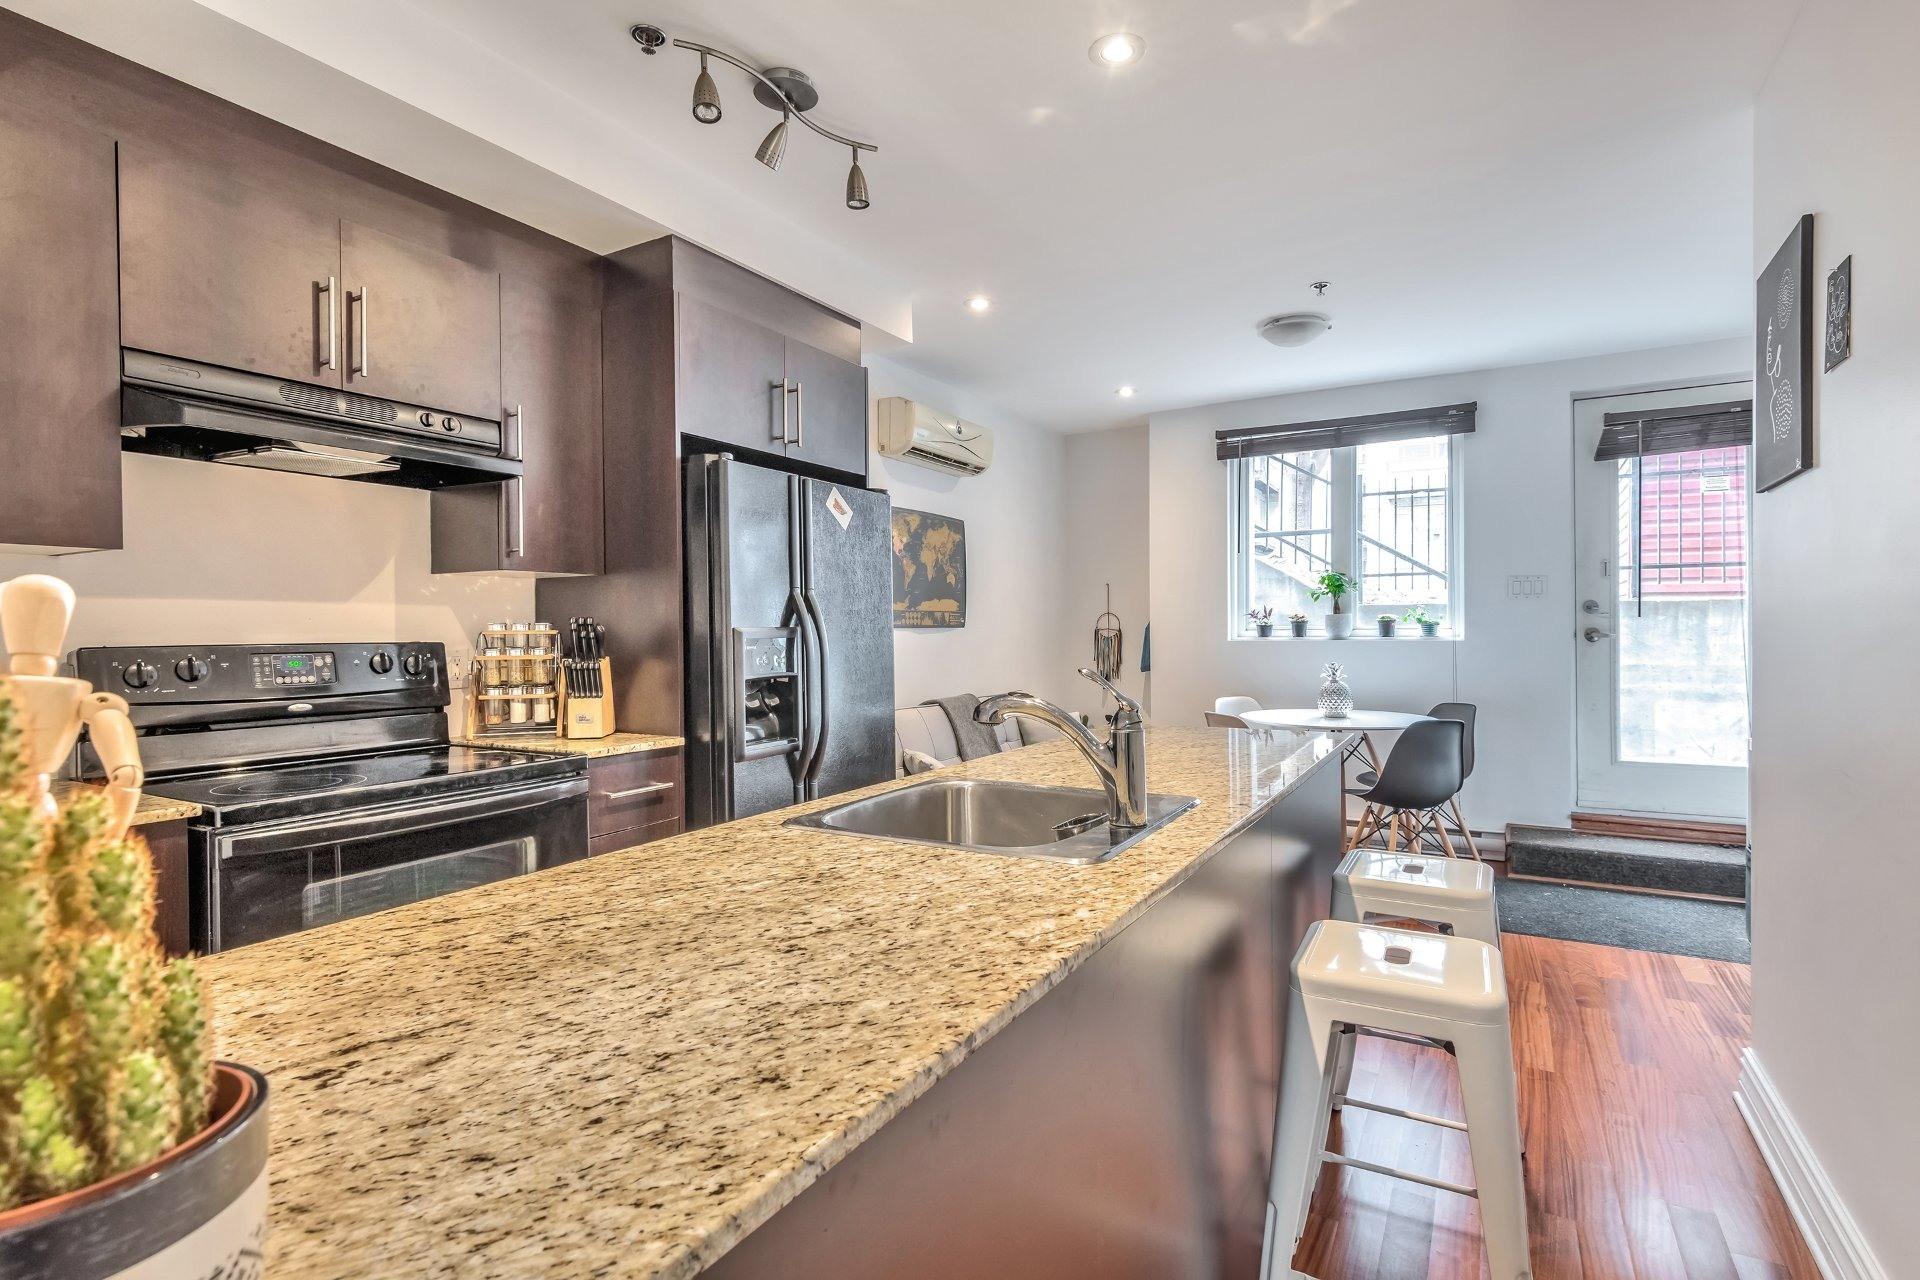 image 8 - Departamento En venta Le Plateau-Mont-Royal Montréal  - 3 habitaciones